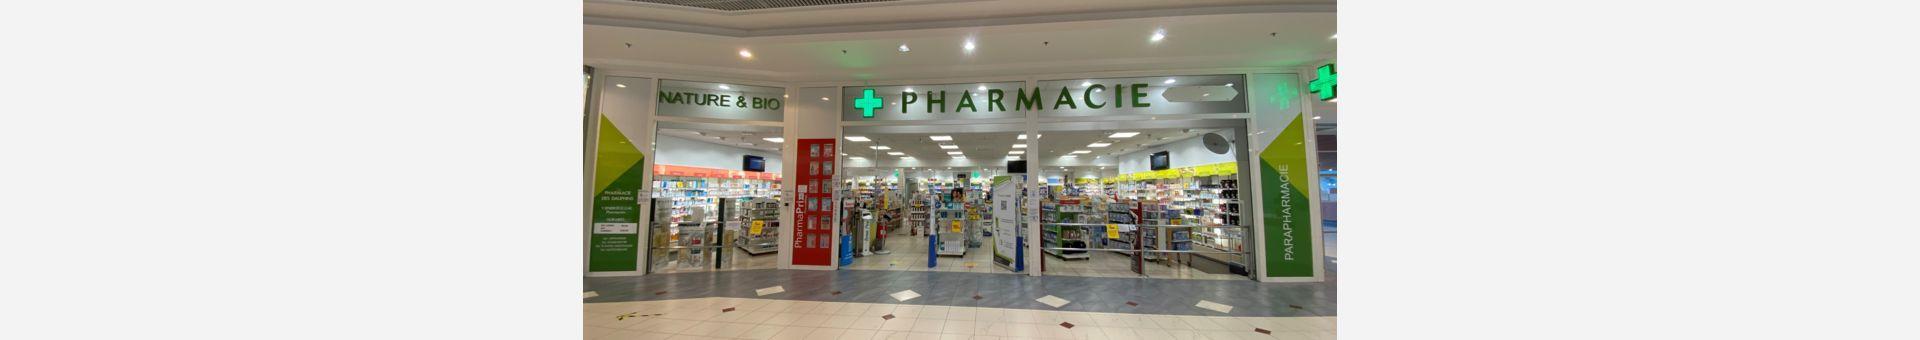 Pharmacie Des Dauphins,TIGNIEU-JAMEYZIEU